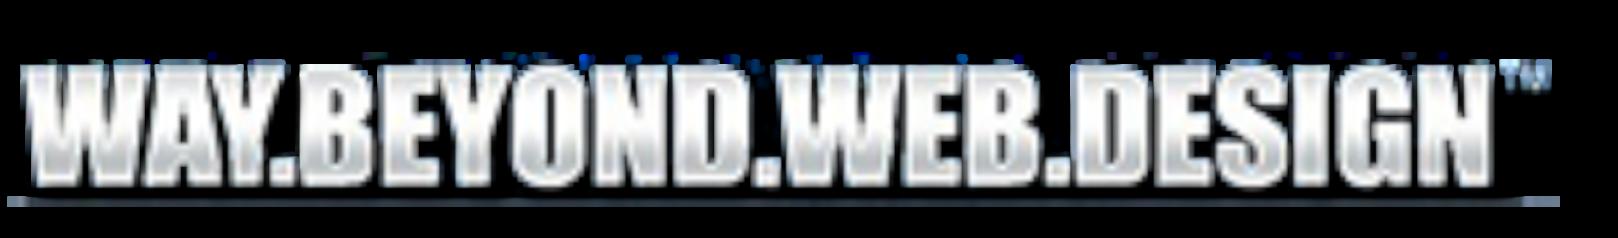 WayBeyond Web Design